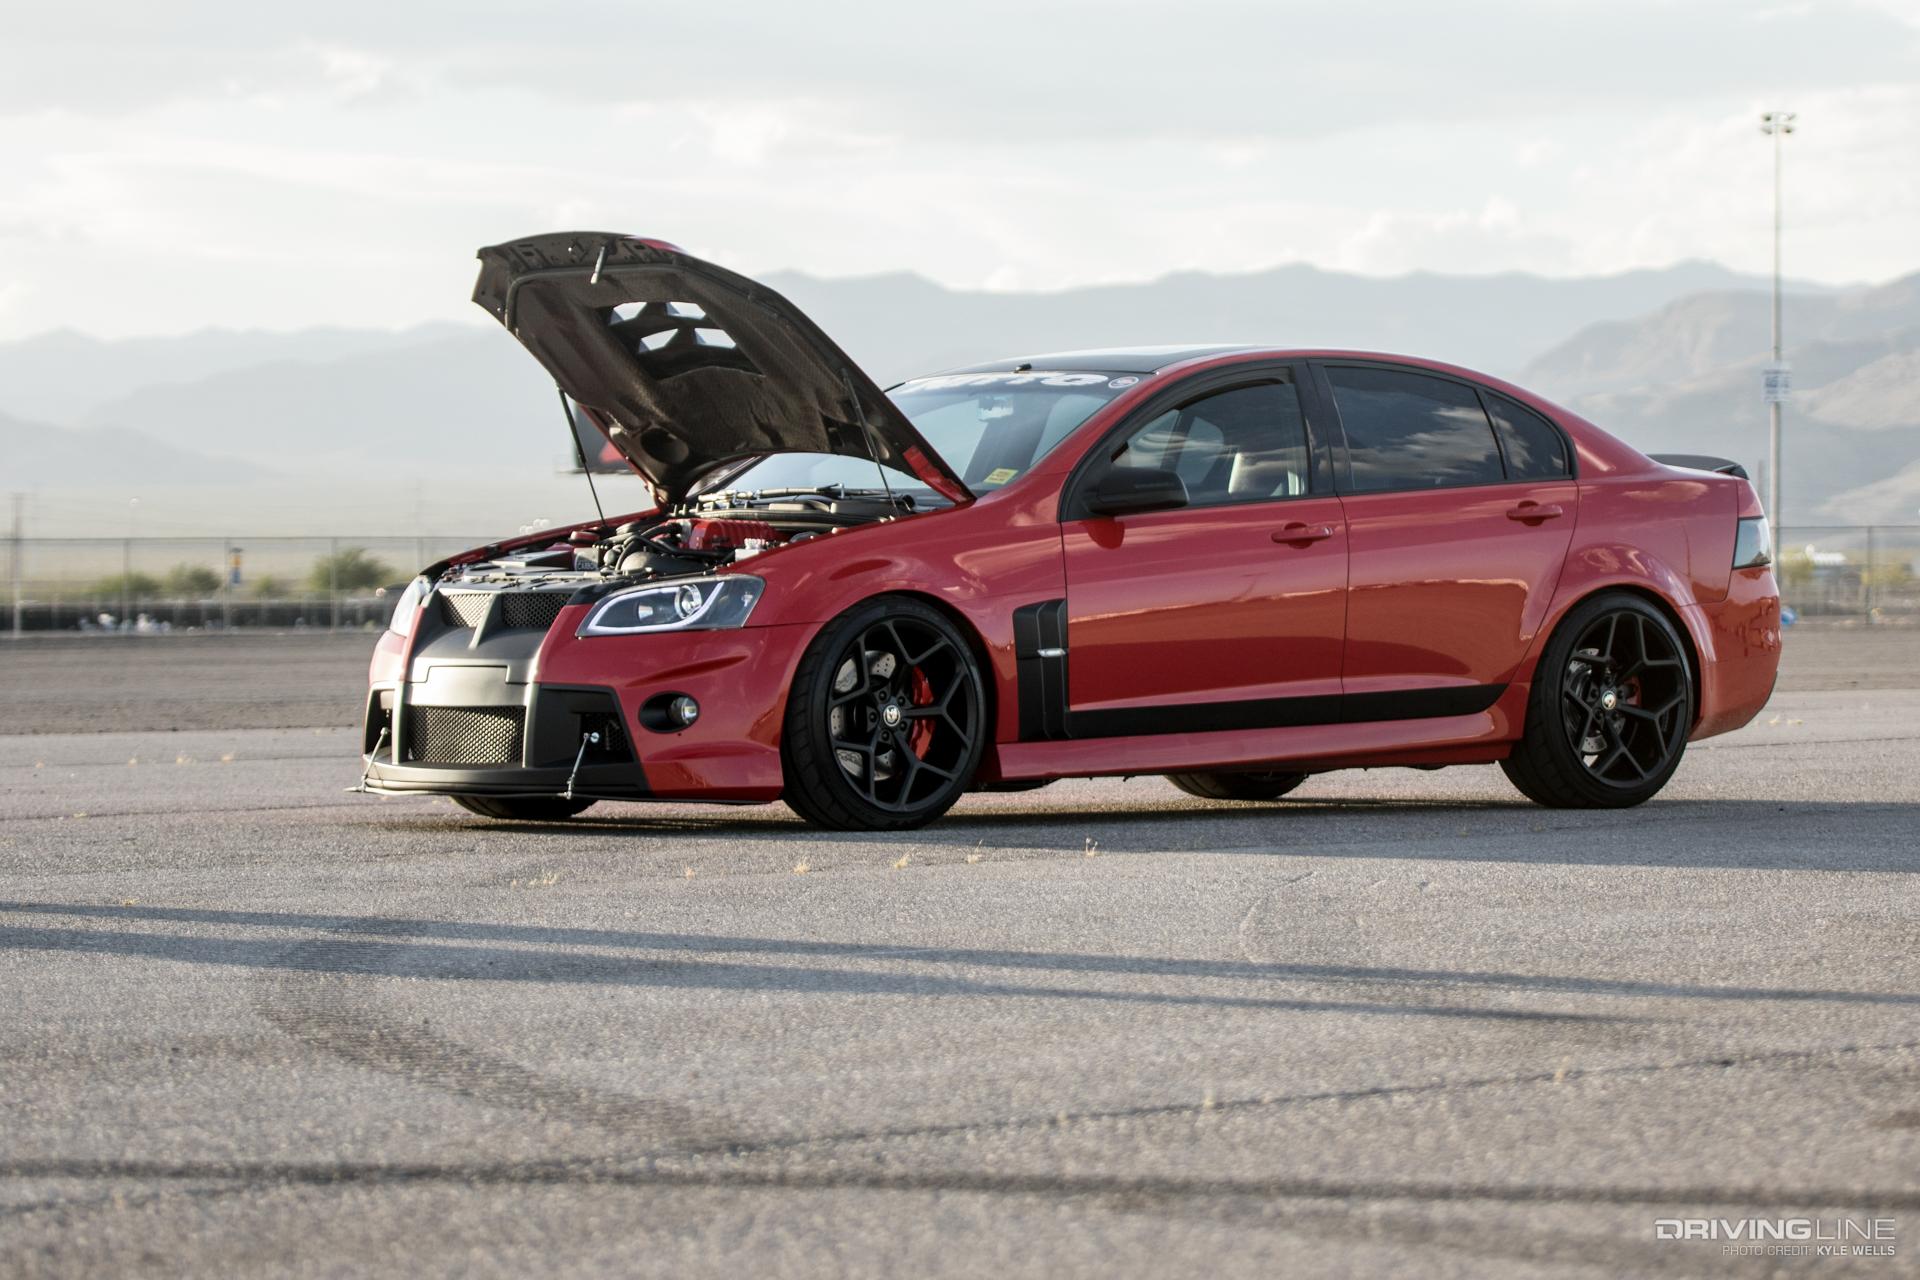 Aussie Beast: A 950HP, Holden-Converted Pontiac G8 | DrivingLine